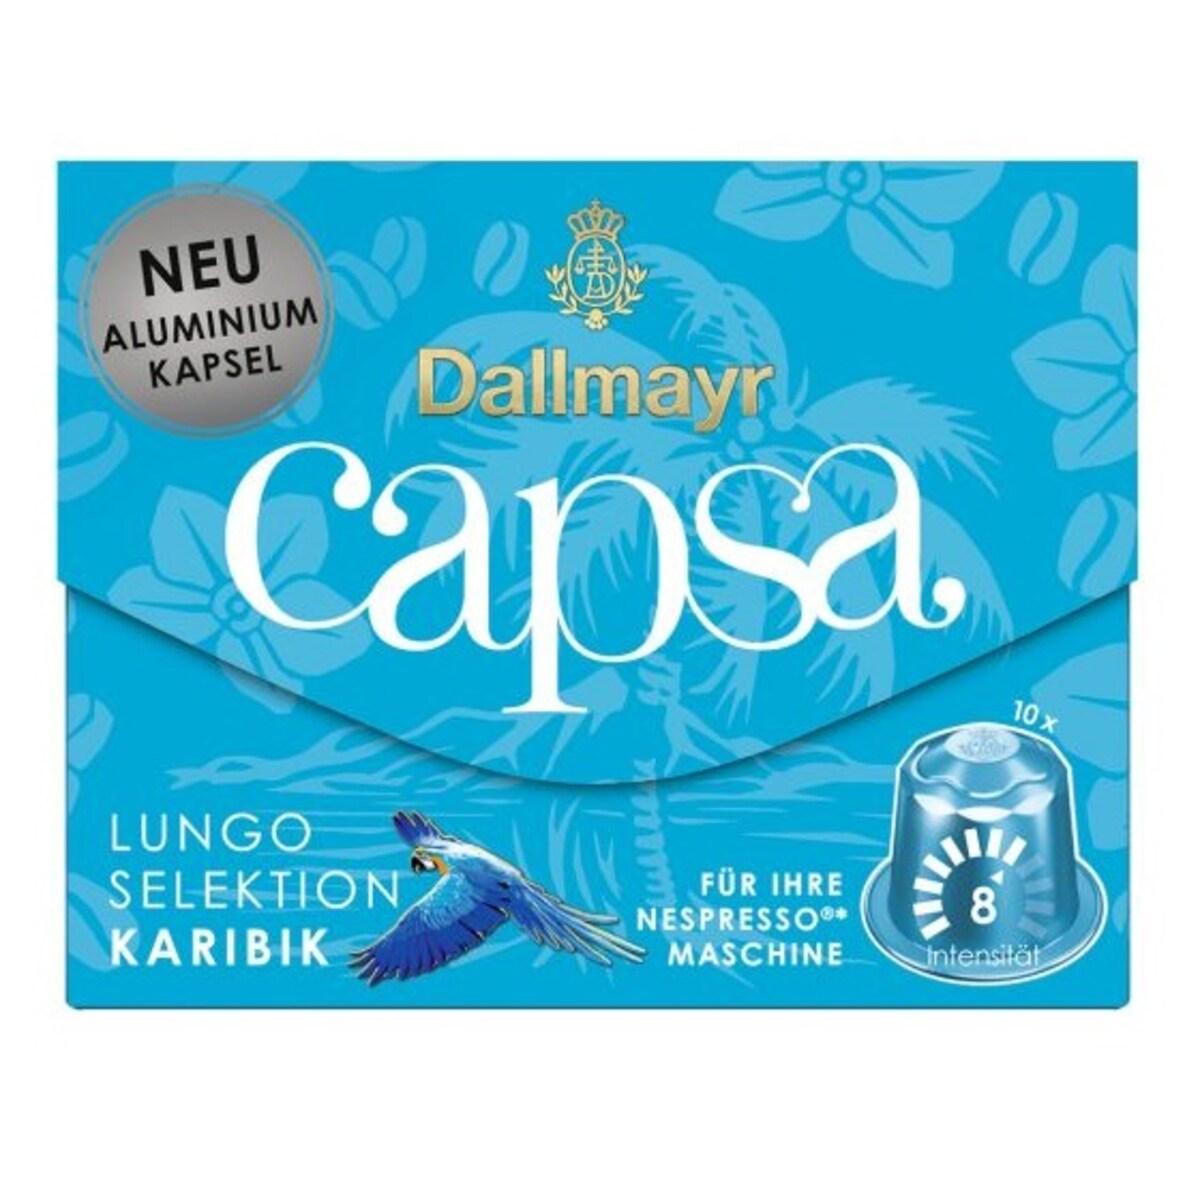 Dallmayr capsa Lungo Selection Karibik  Nespresso съвместими капсули